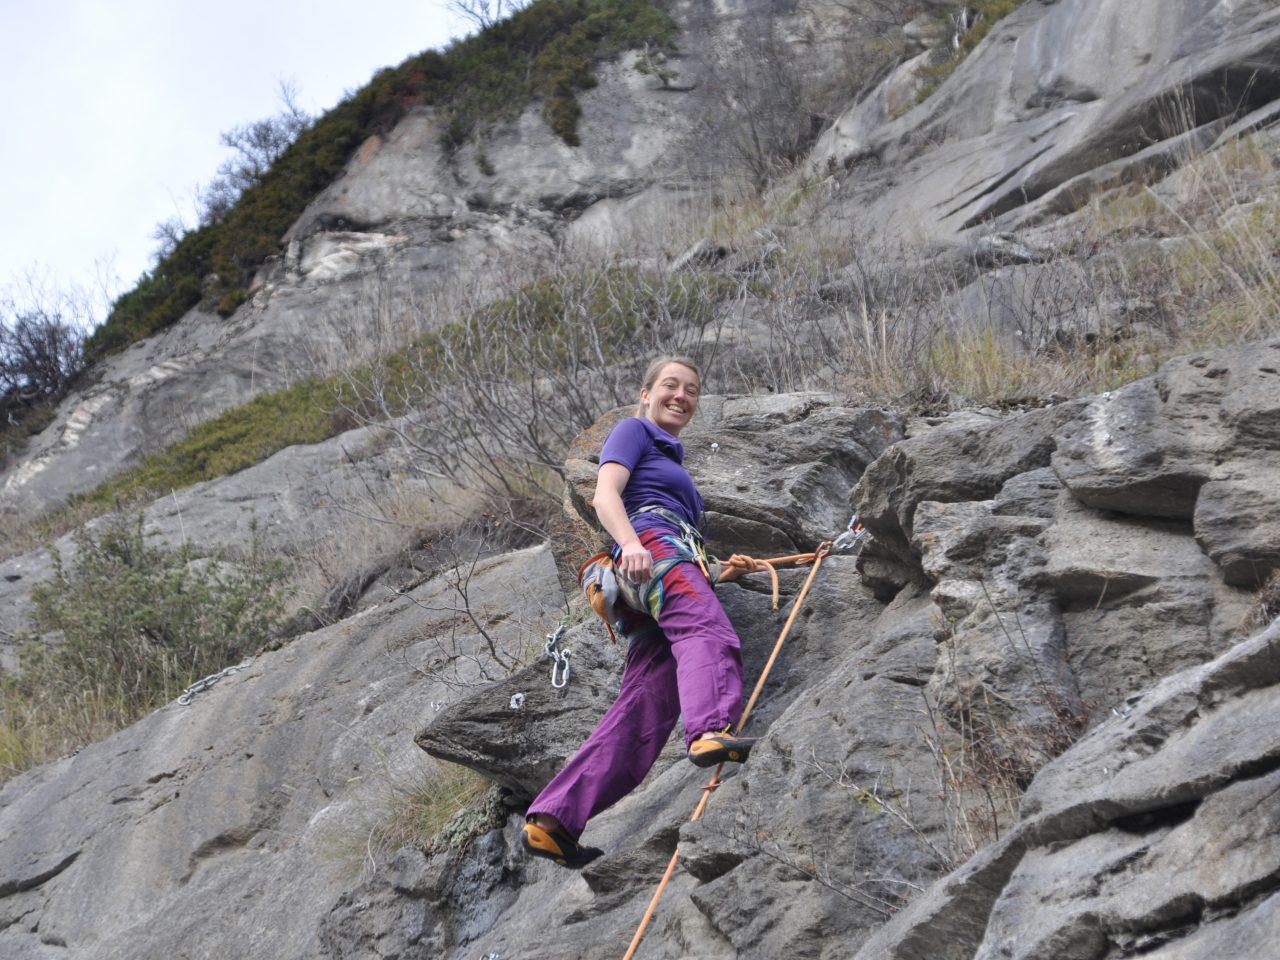 Monatsfrau Claudia Knoll Klettern